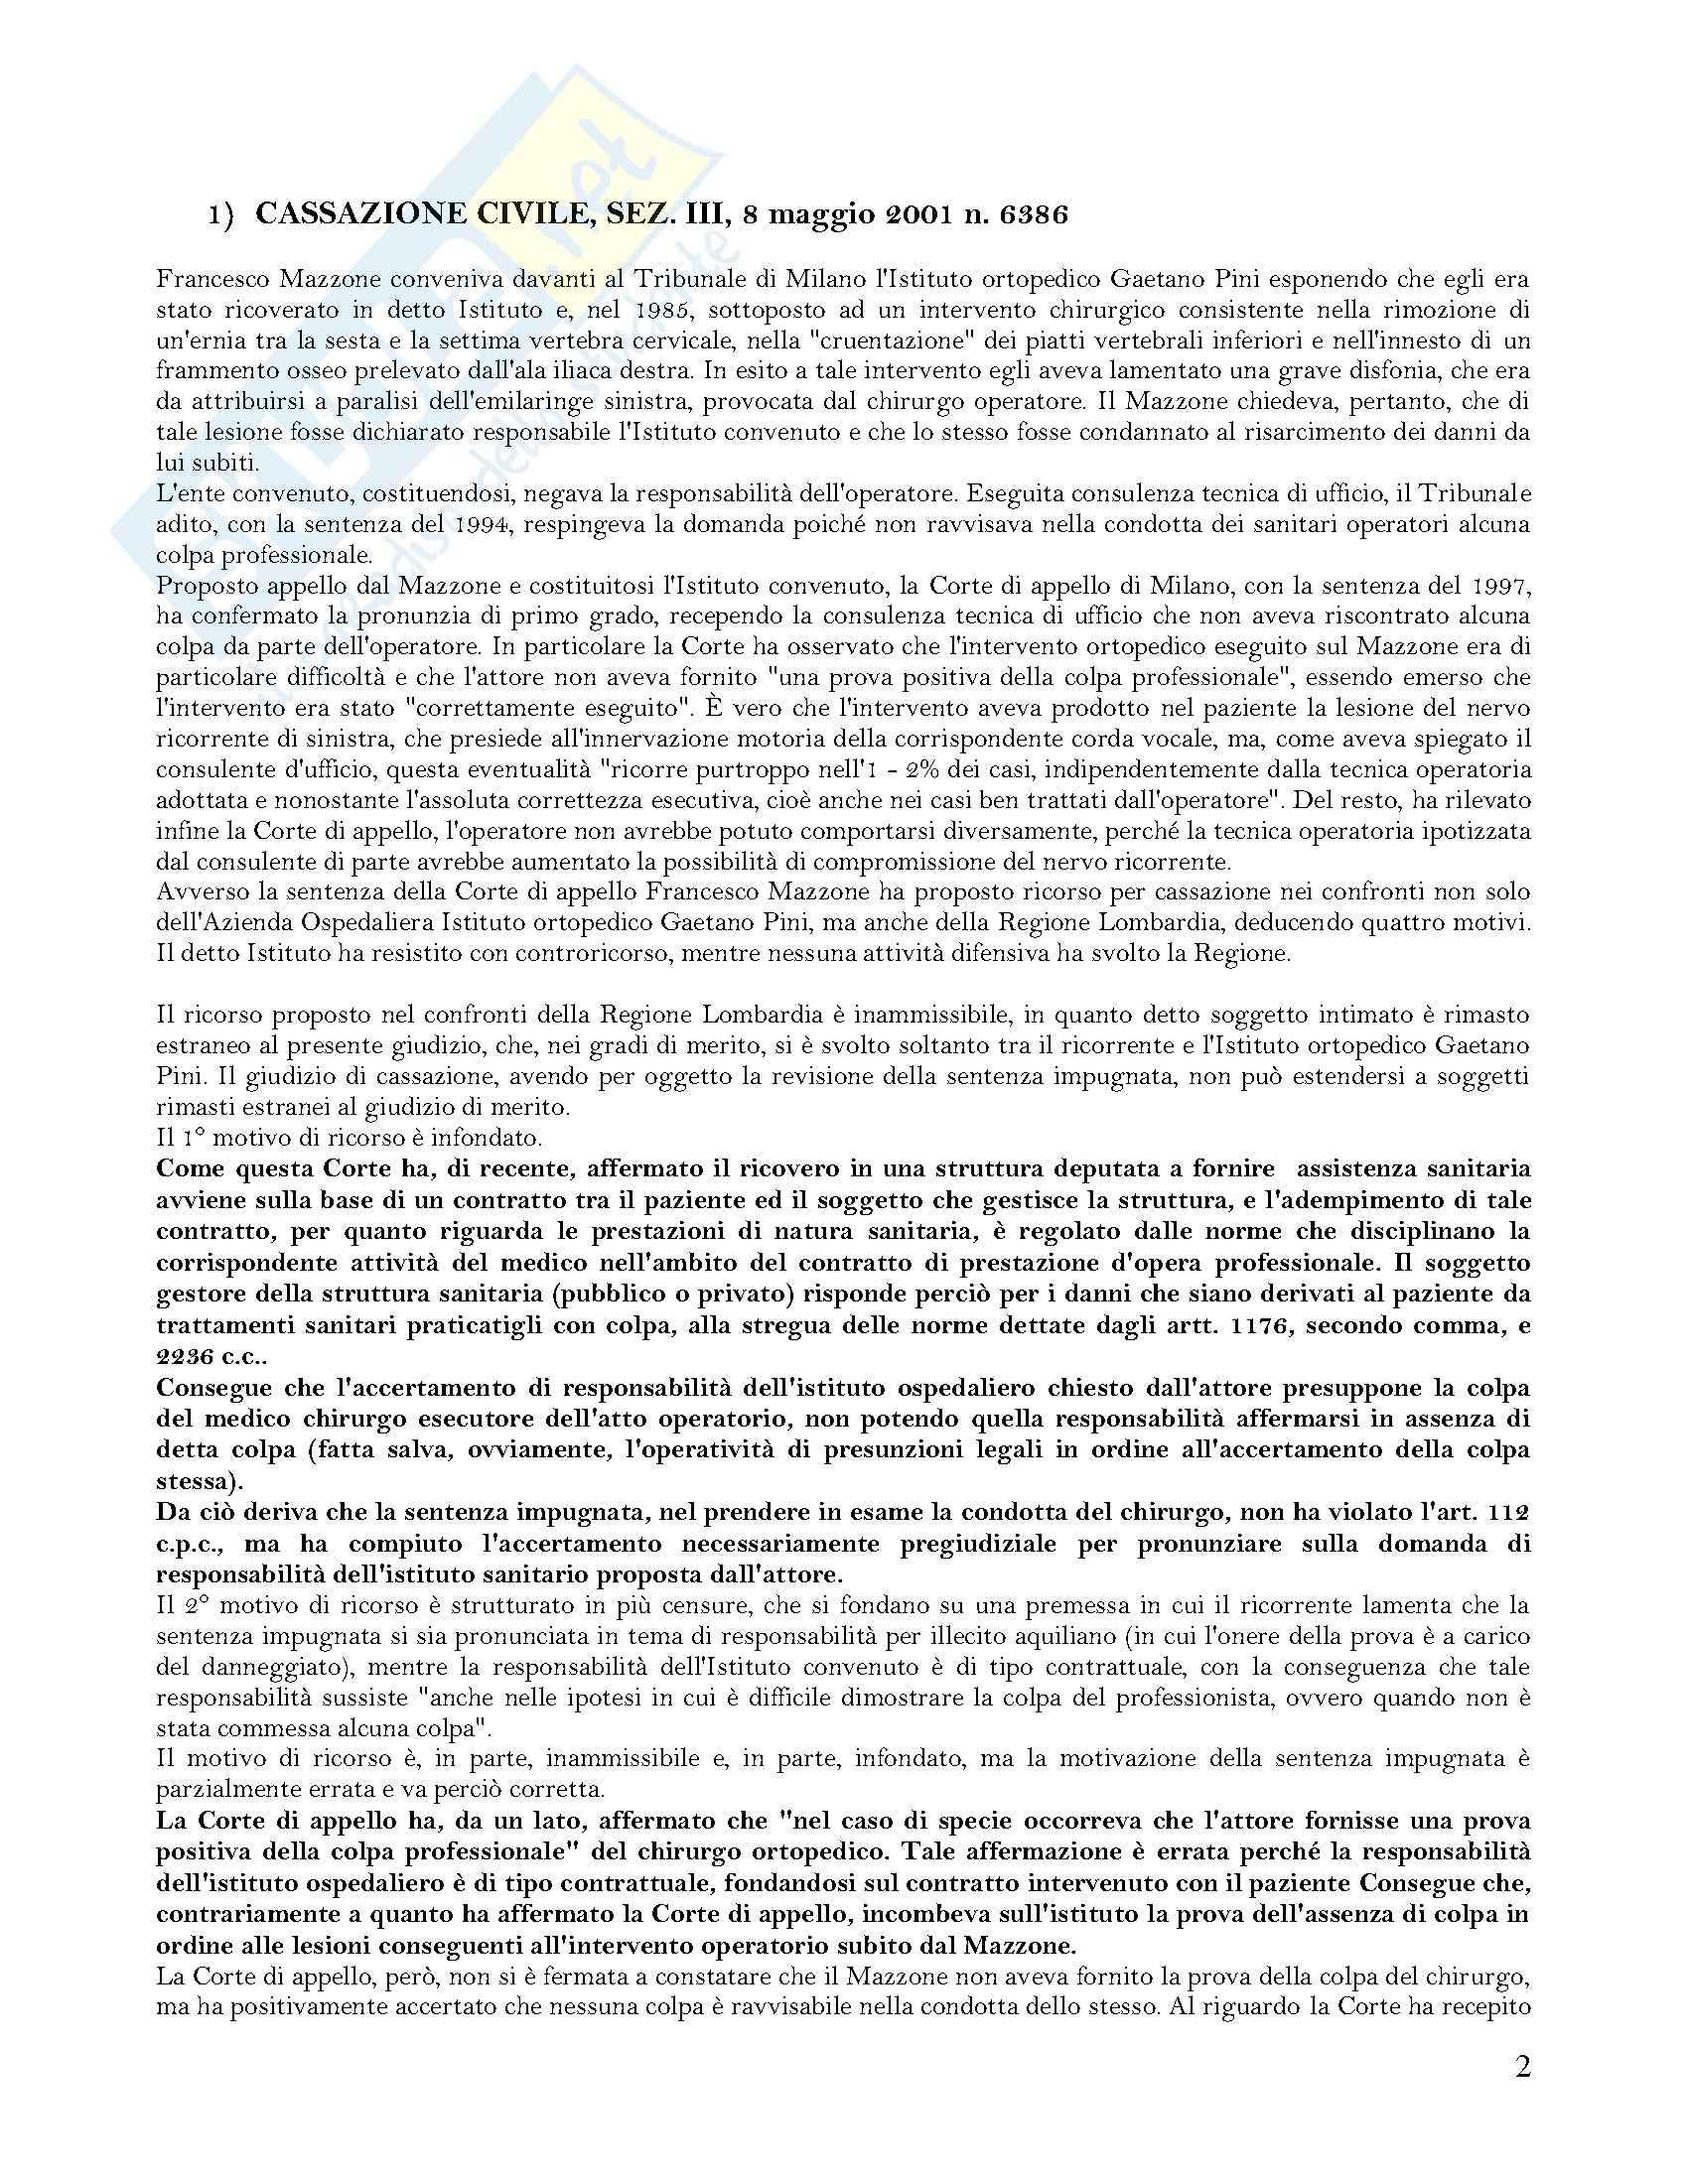 Responsabilità strutture sanitarie Pag. 2